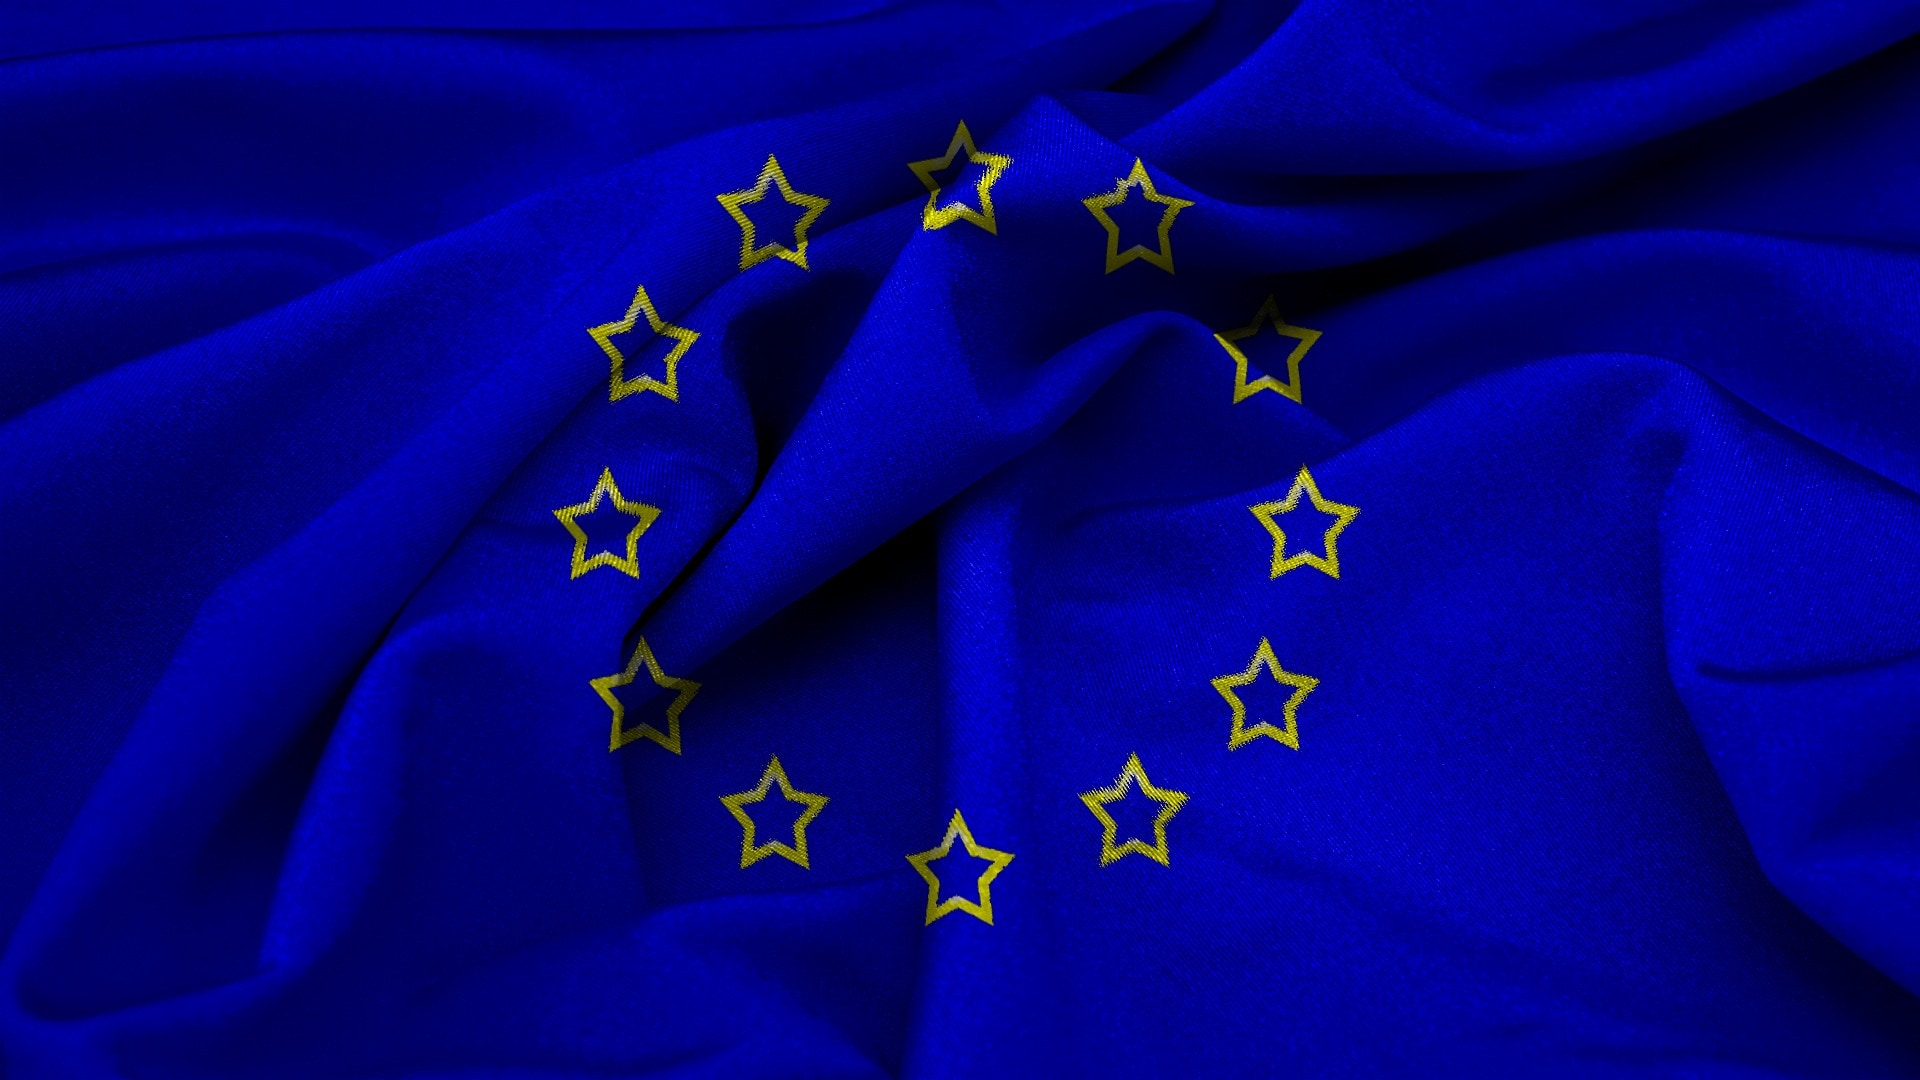 Europe Flags Flag blue flag image Peakpx 1920x1080